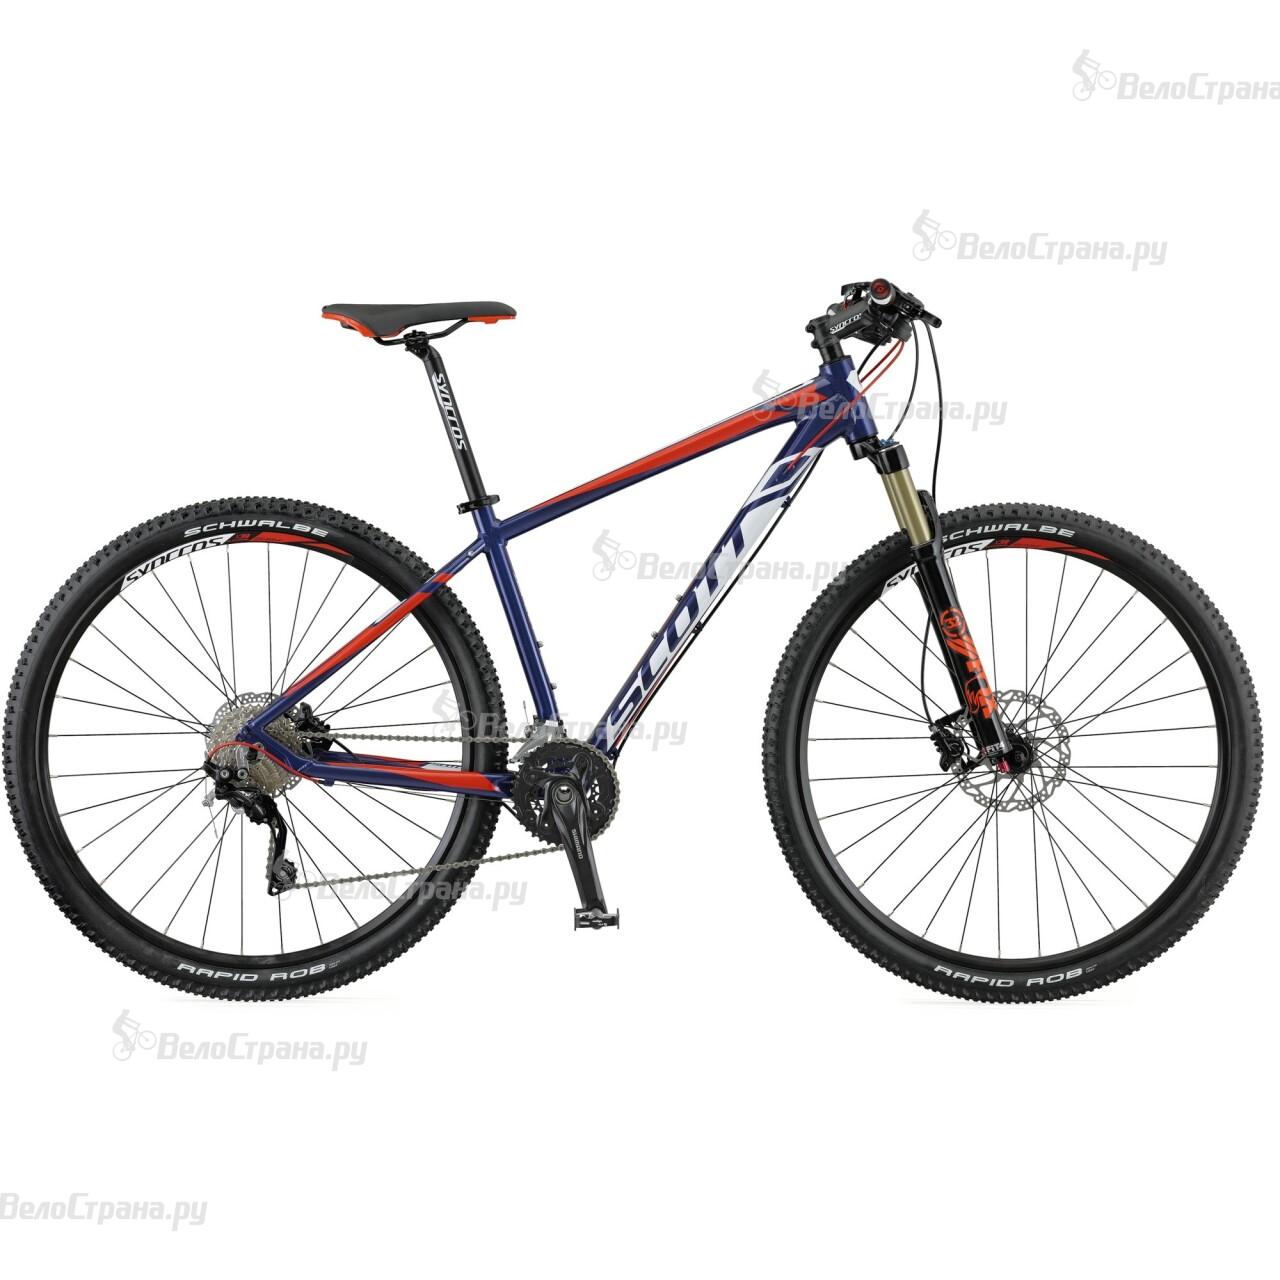 Велосипед Scott Aspect 900 (2016) велосипед scott aspect 720 27 5 2016